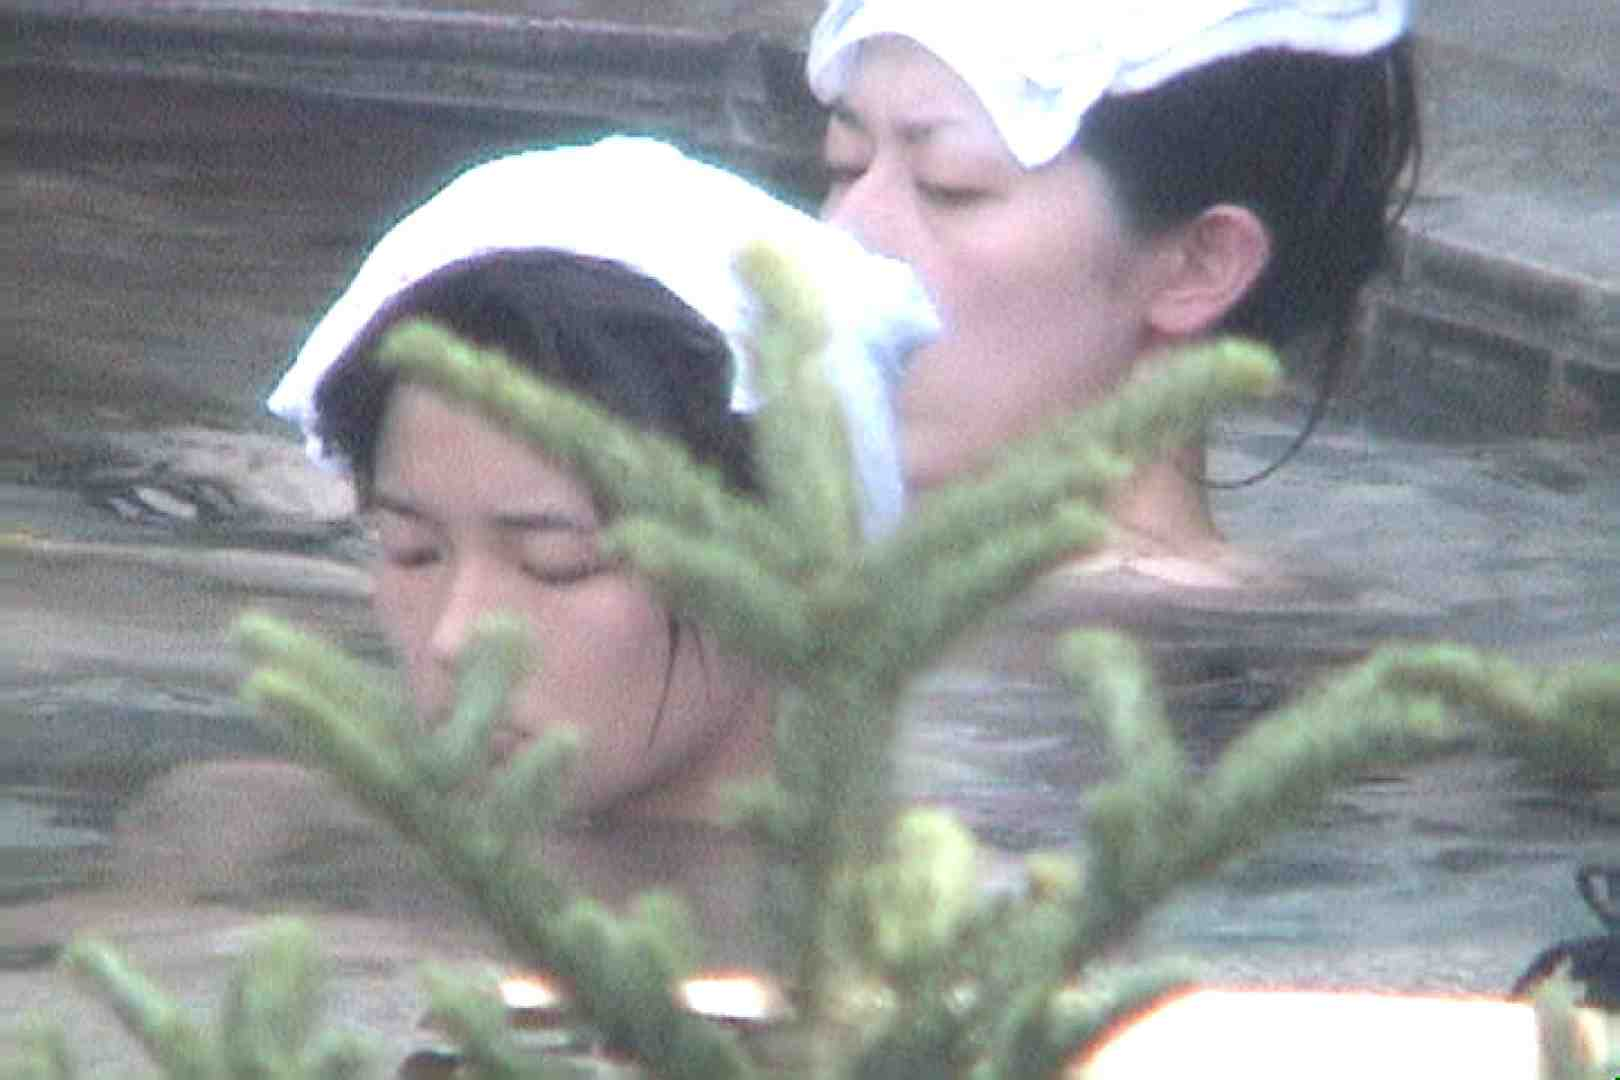 Aquaな露天風呂Vol.80【VIP限定】 盗撮 | HなOL  66pic 47